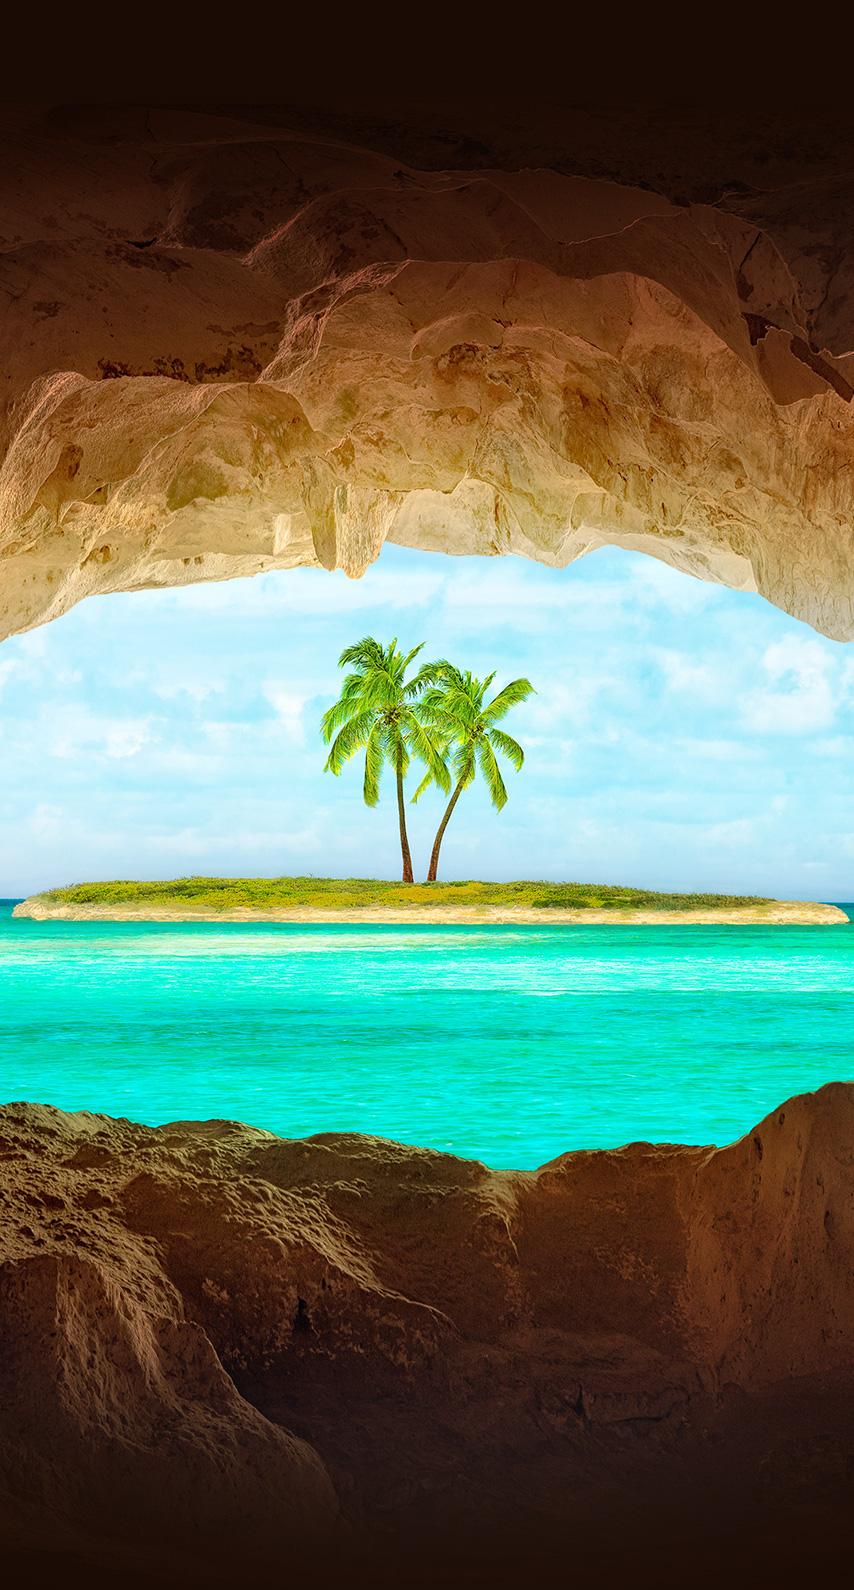 island, tropical